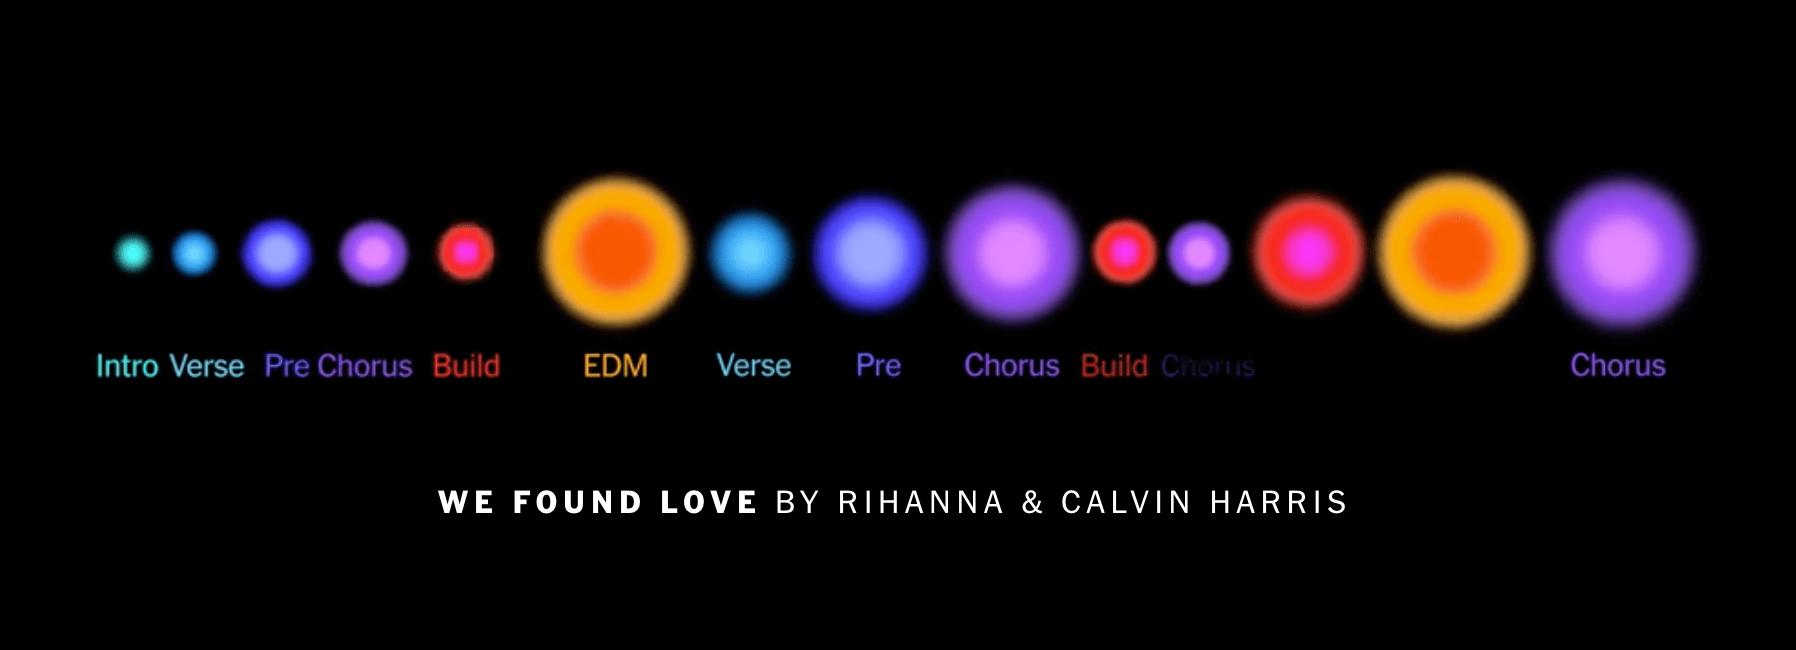 Visual deconstruction of popular songs